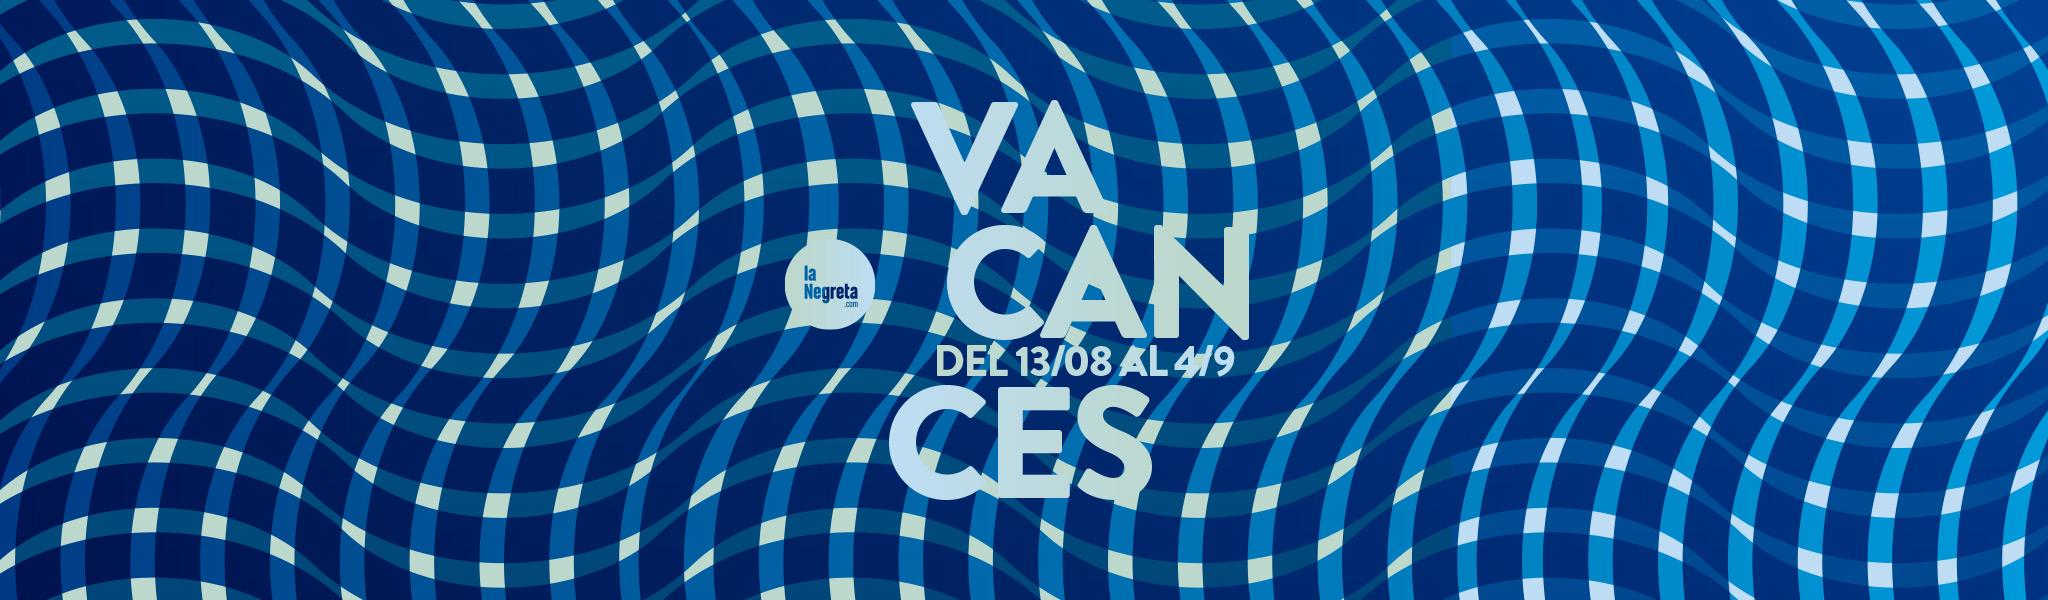 AAFF_laNegreta-VACANCES2016-Slider